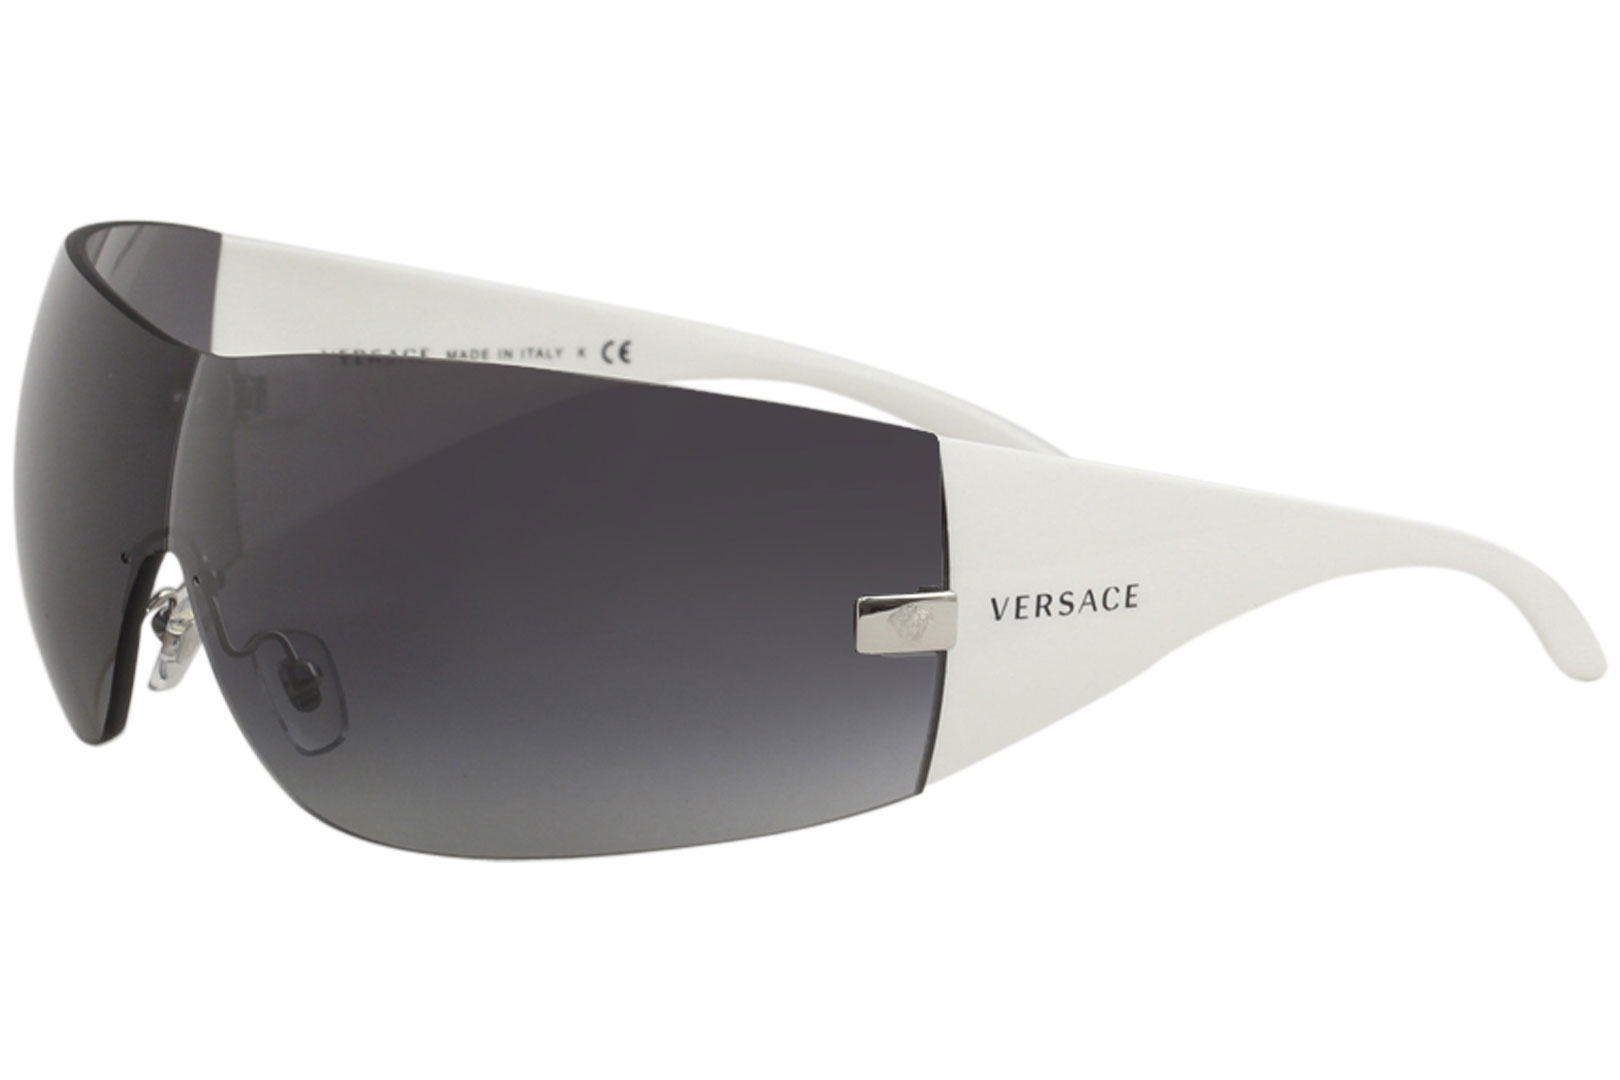 308a28cc83 Details about Versace VE2054 VE 2054 1000 8G Silver White Shields Sunglasses